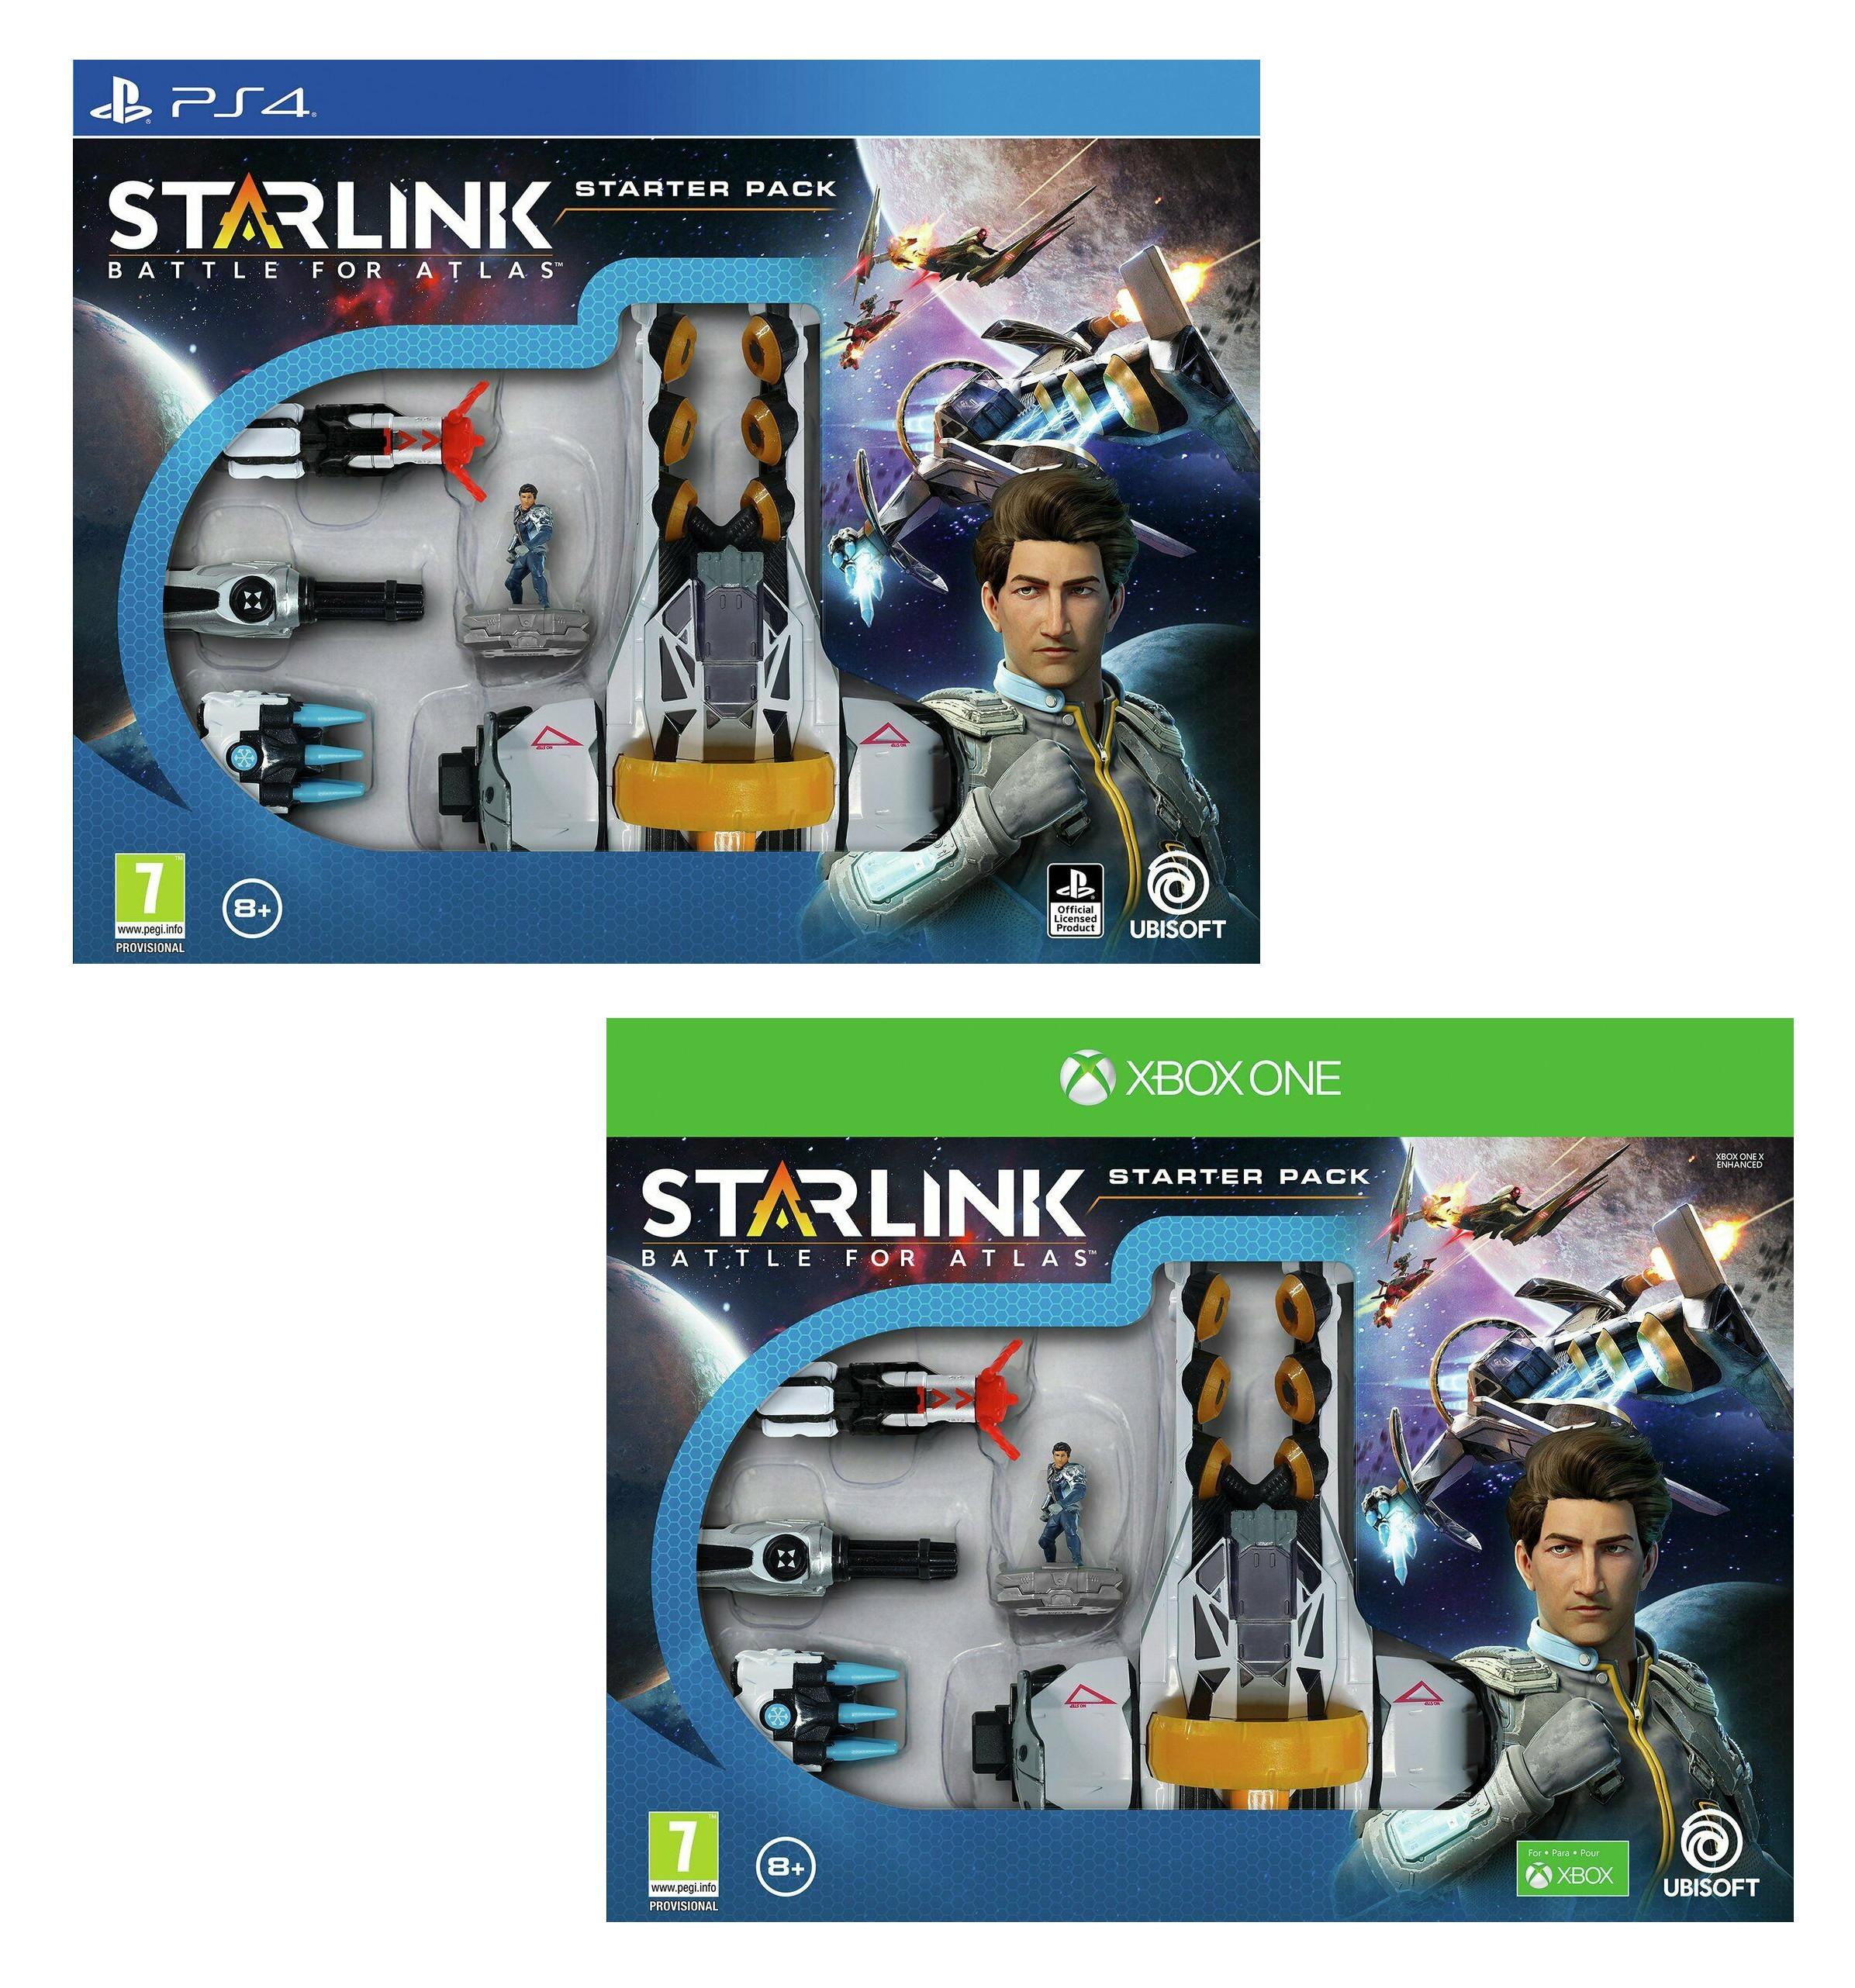 Starlink: Battle for Atlas (PS4 / Xbox One) - £5.99 delivered @ Argos / eBay